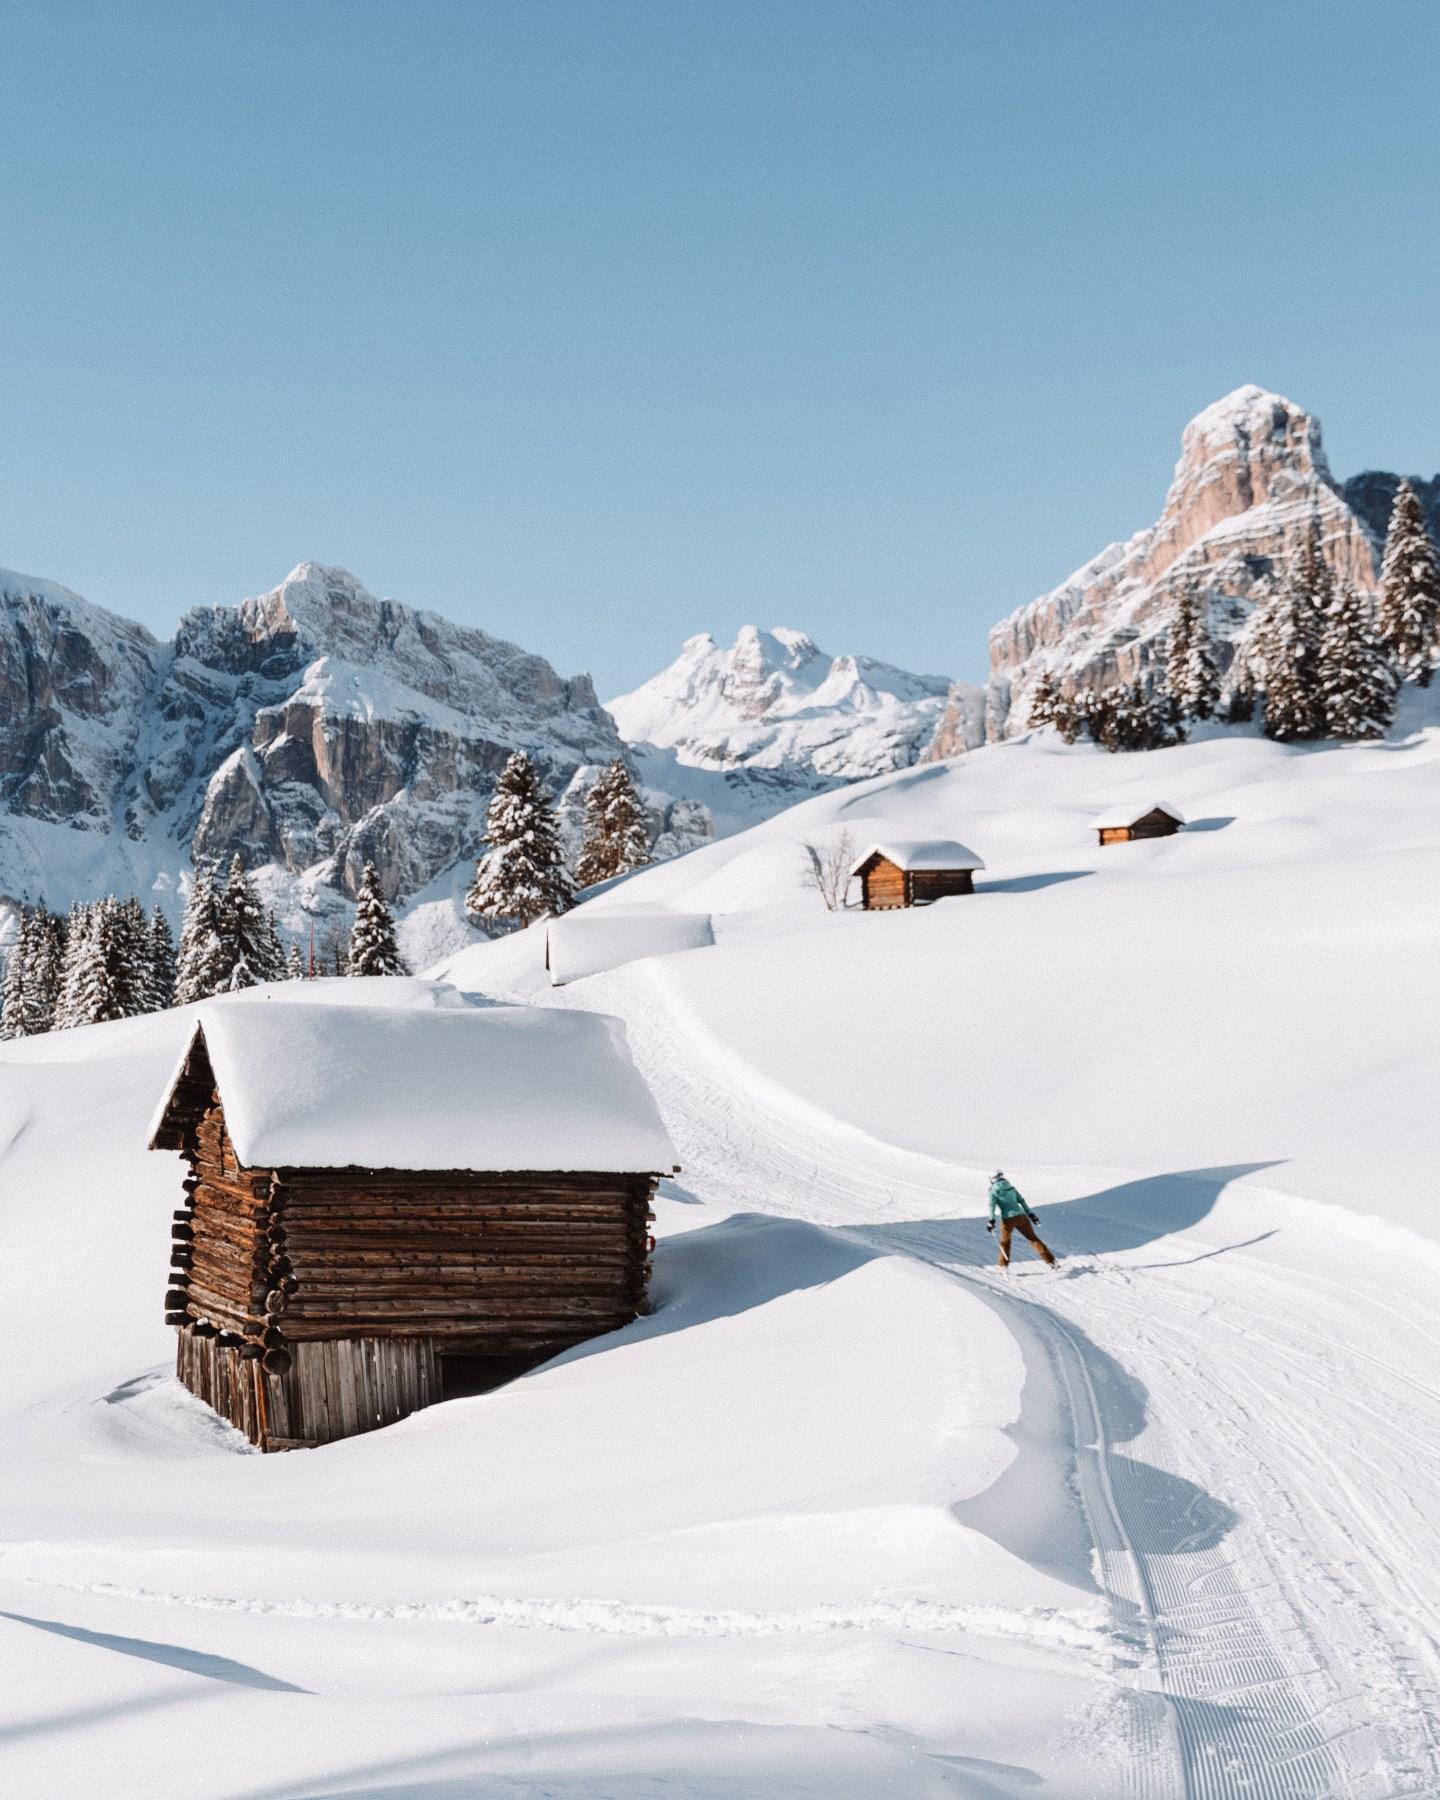 weekend-winter-getaway-dolomites-alliemtaylor-1